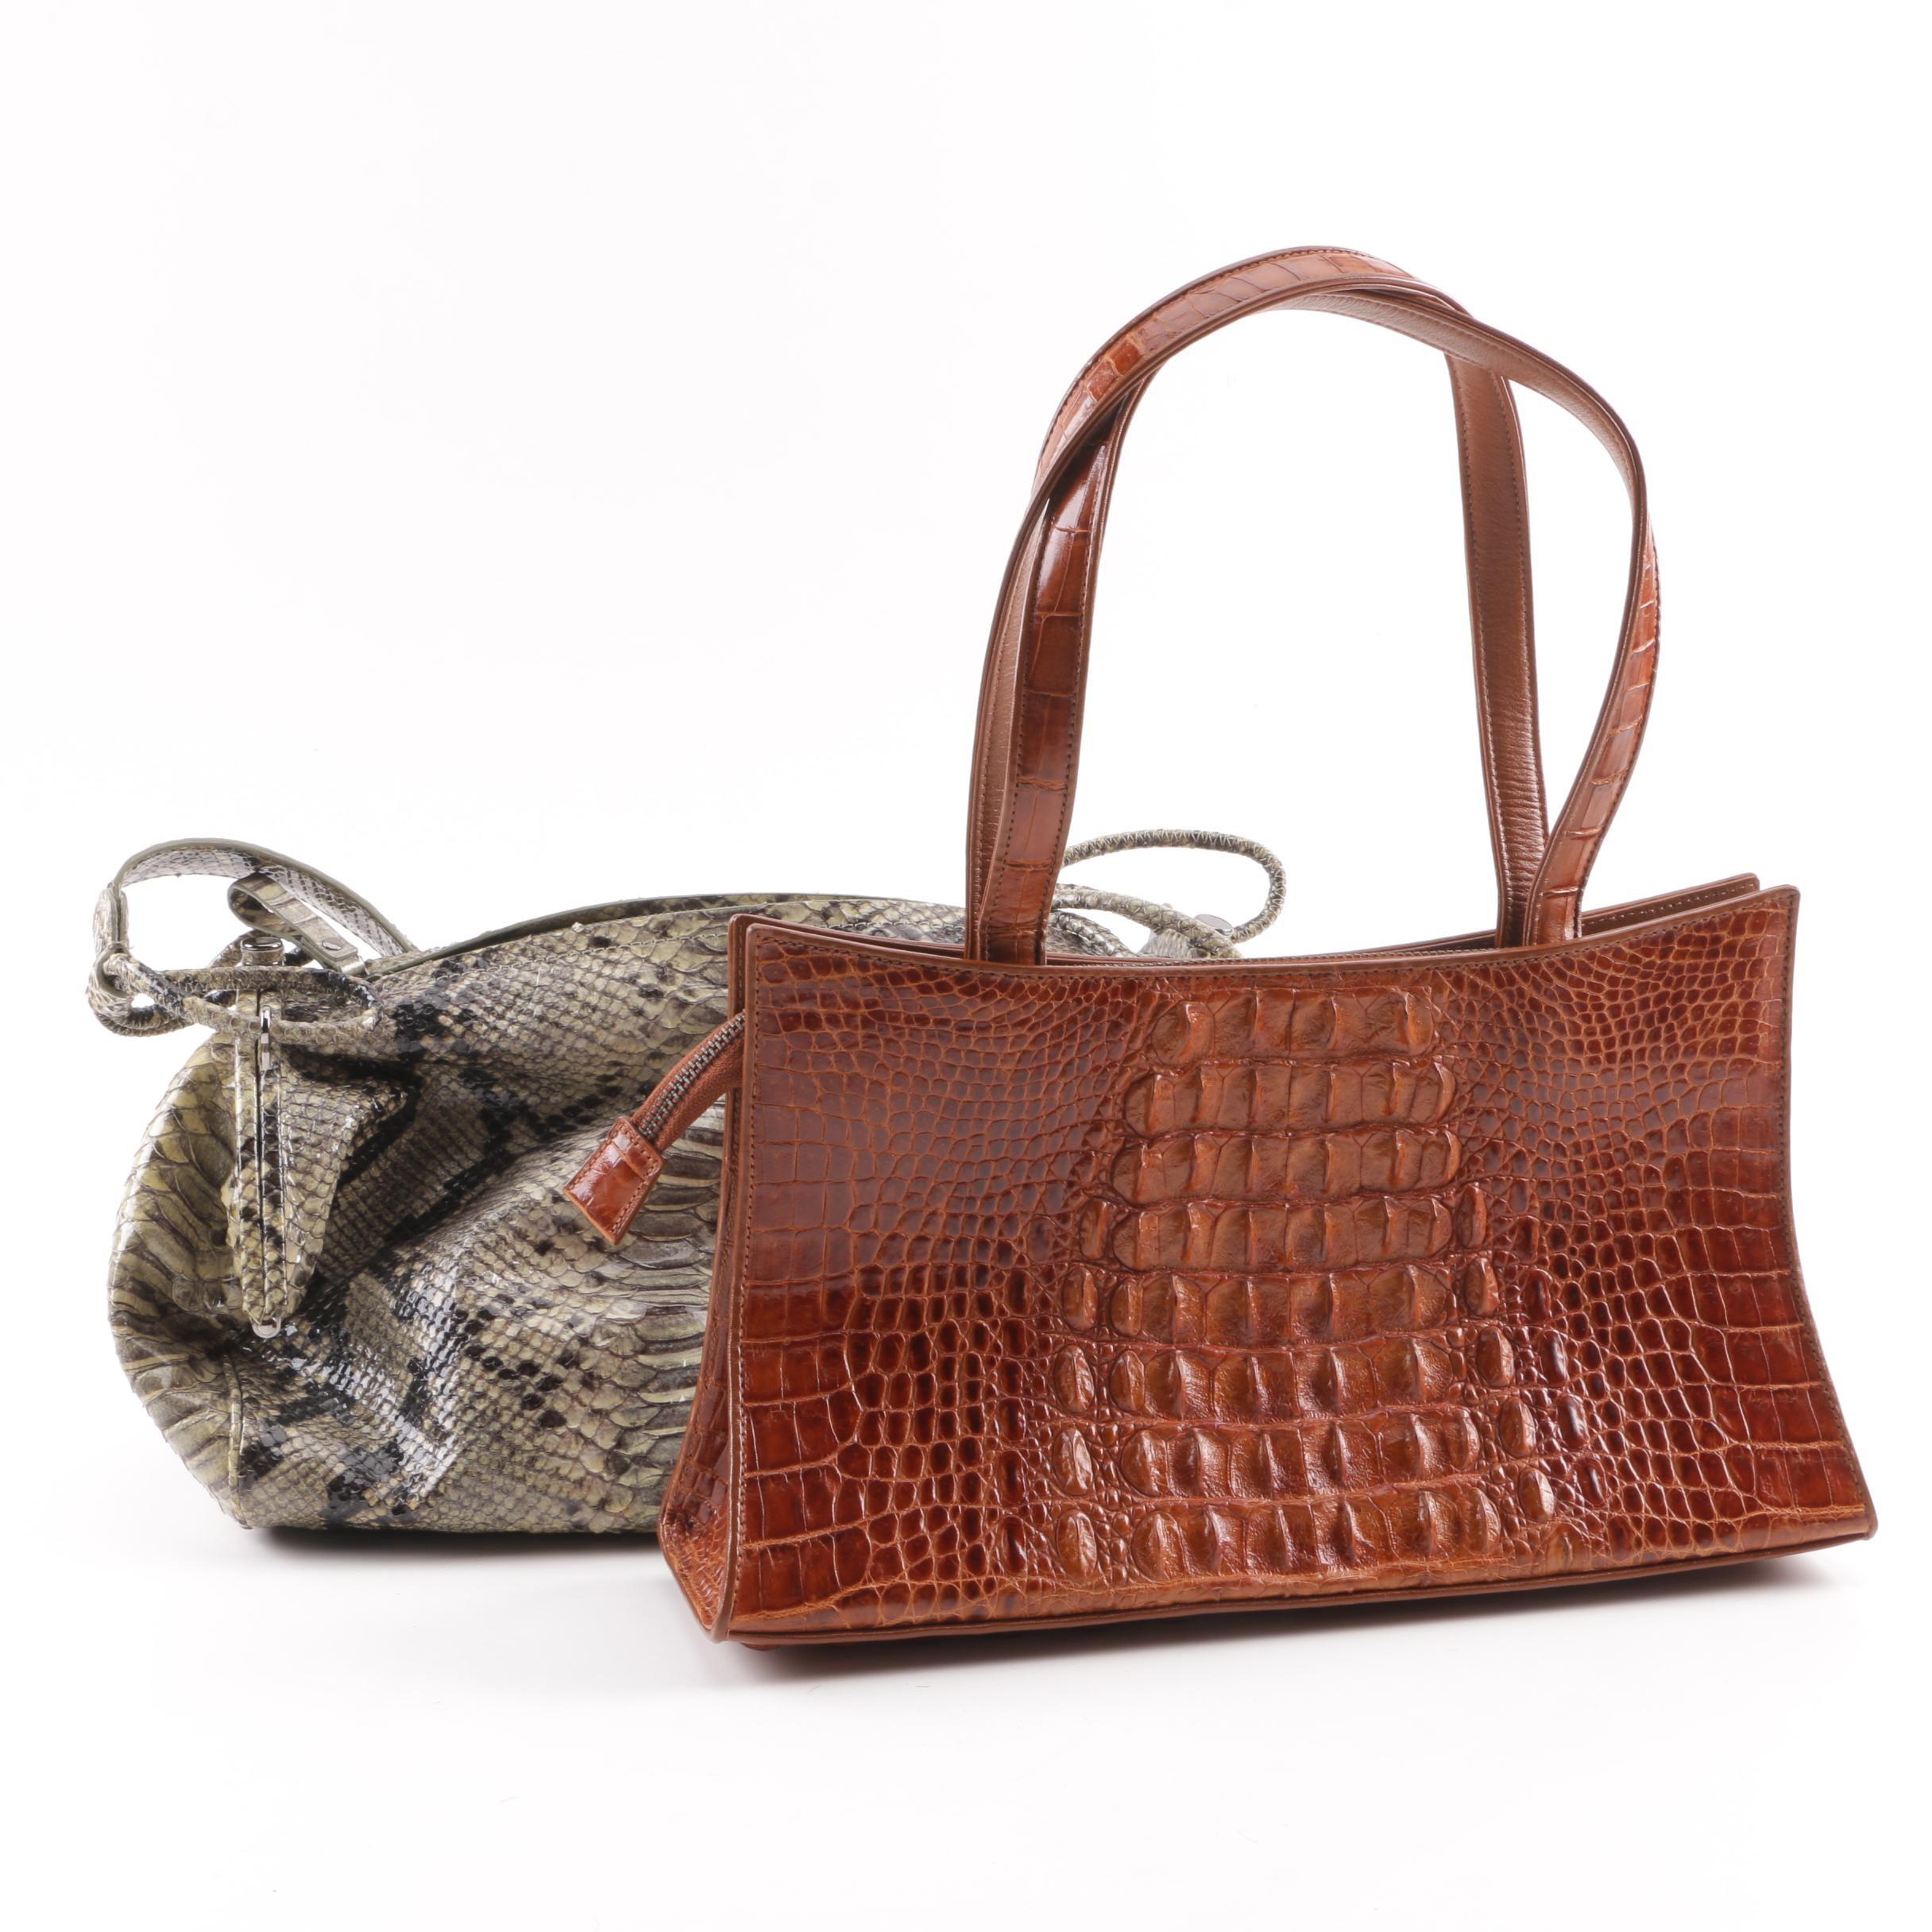 Sondra Roberts Python Skin and Ambassador Roberta Crocodile Skin Handbags